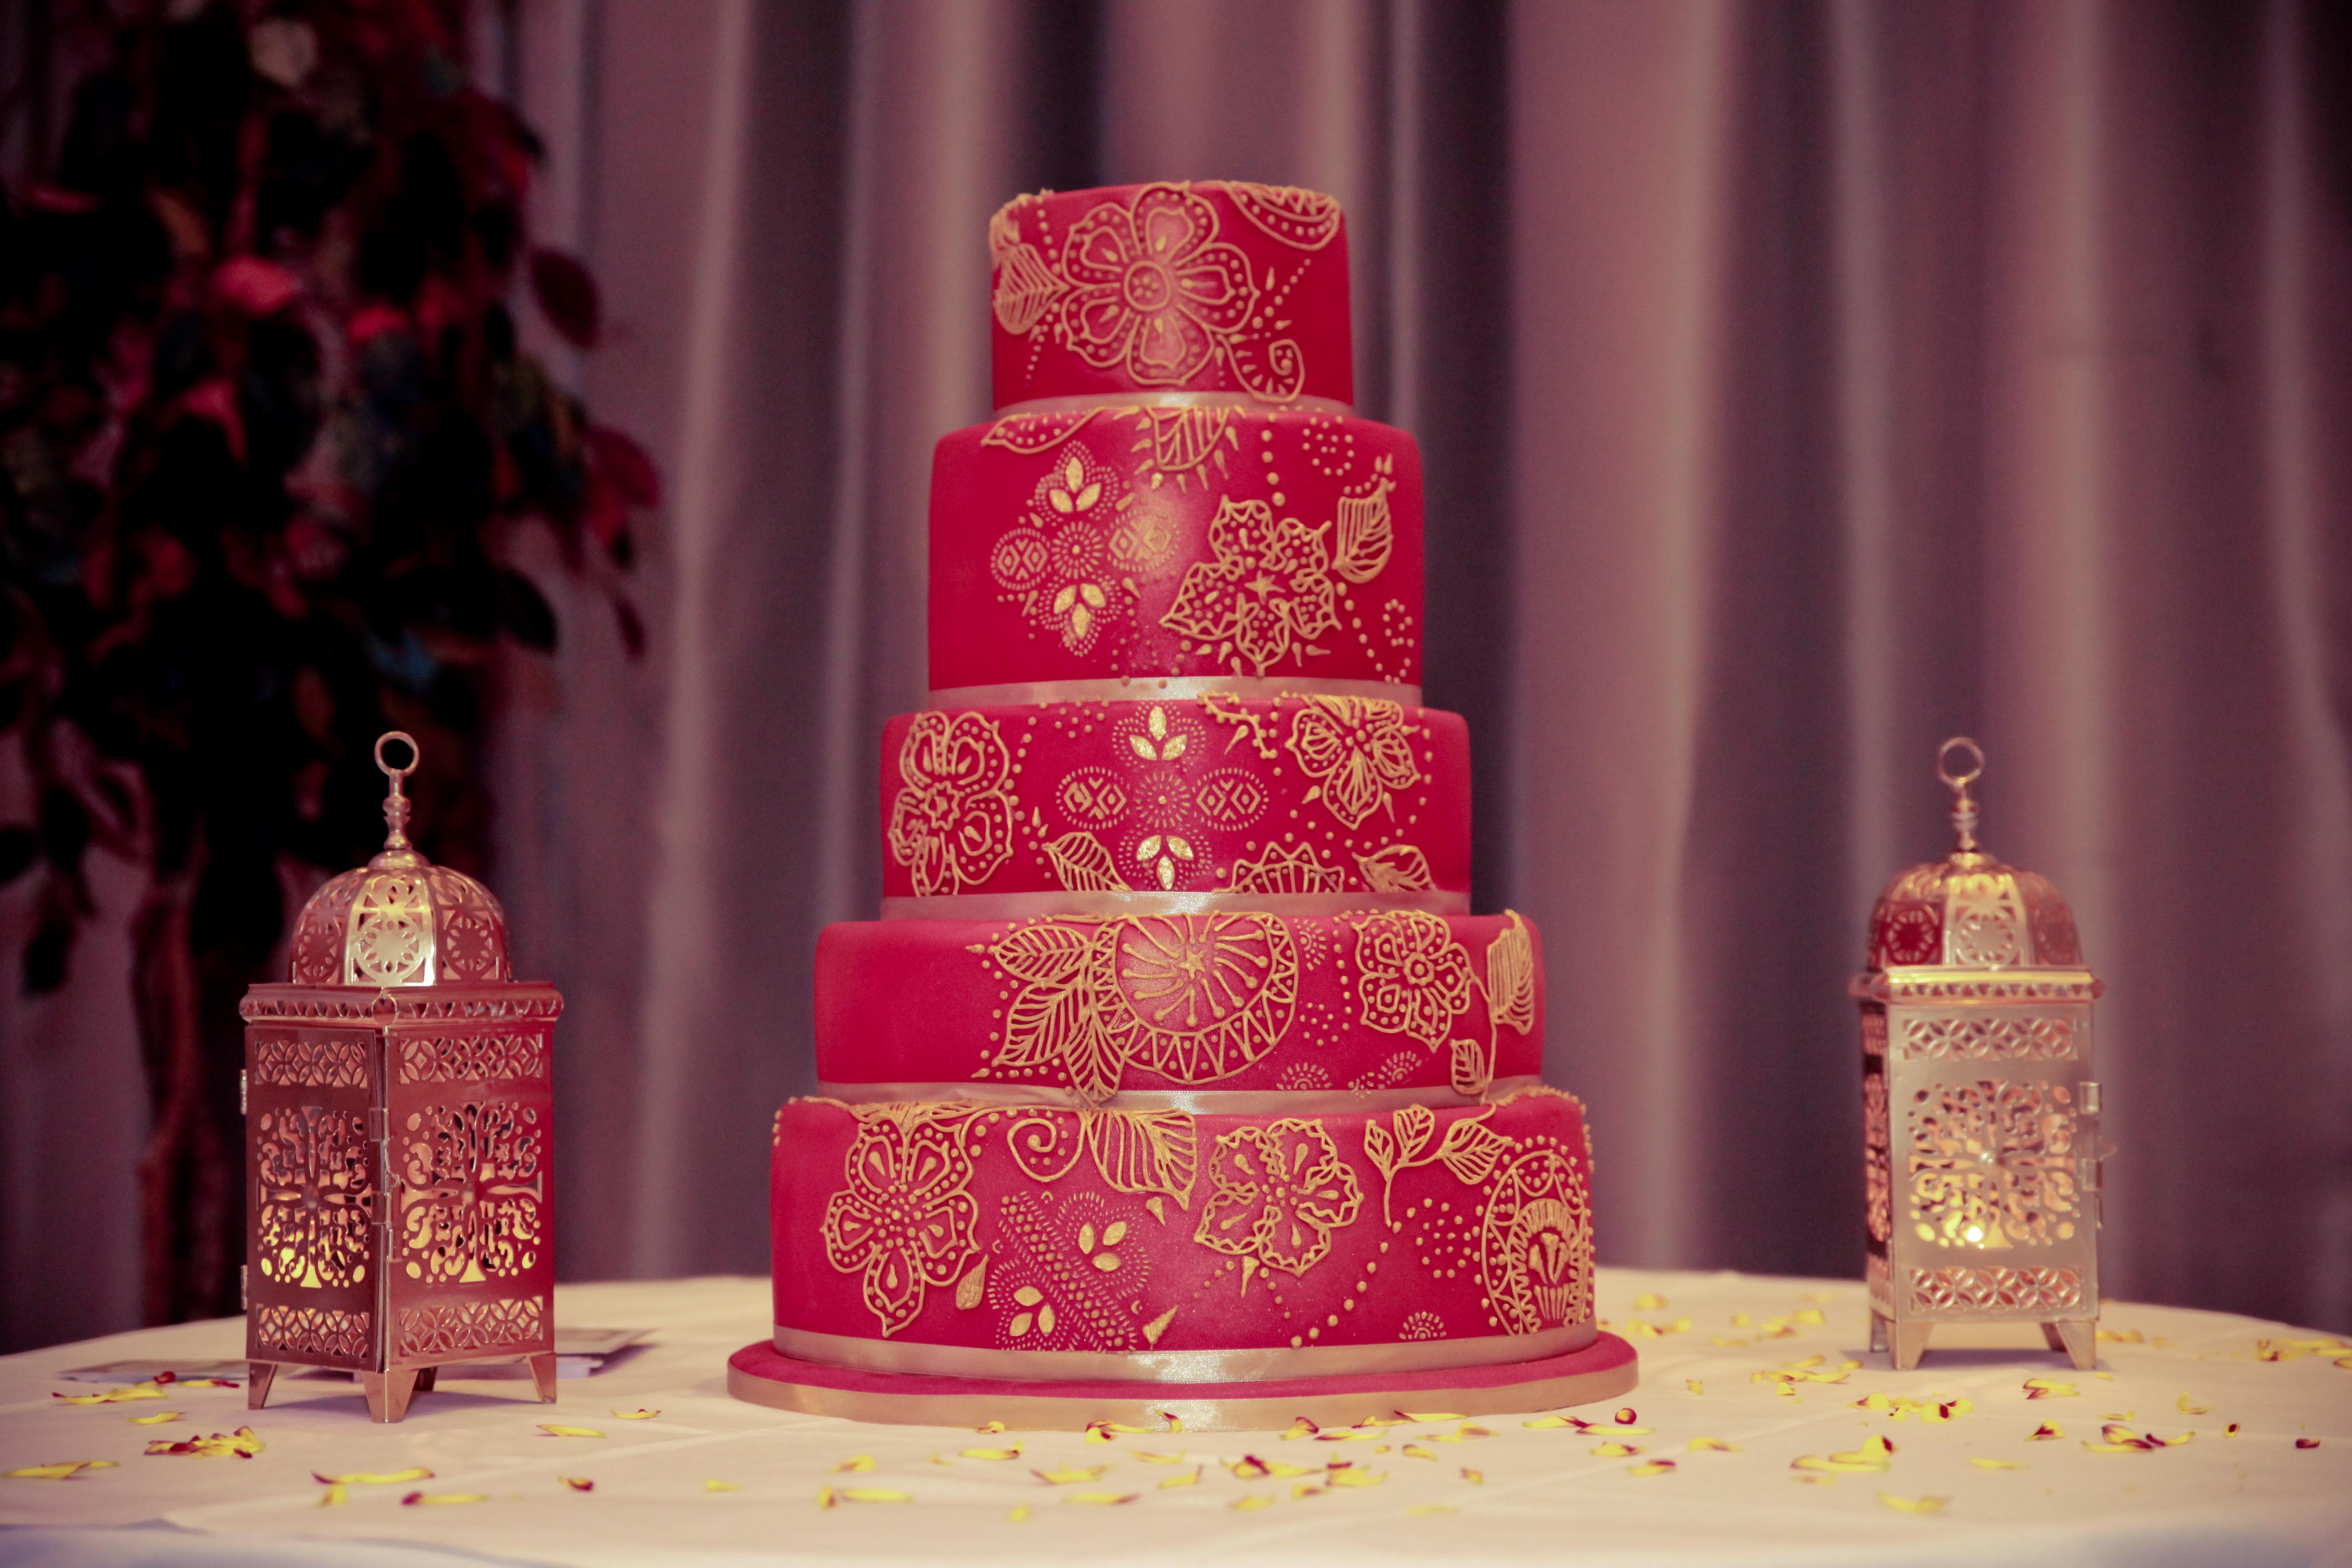 Cake For Mehndi Ceremony : Mehndi cake jamie bakes cakes